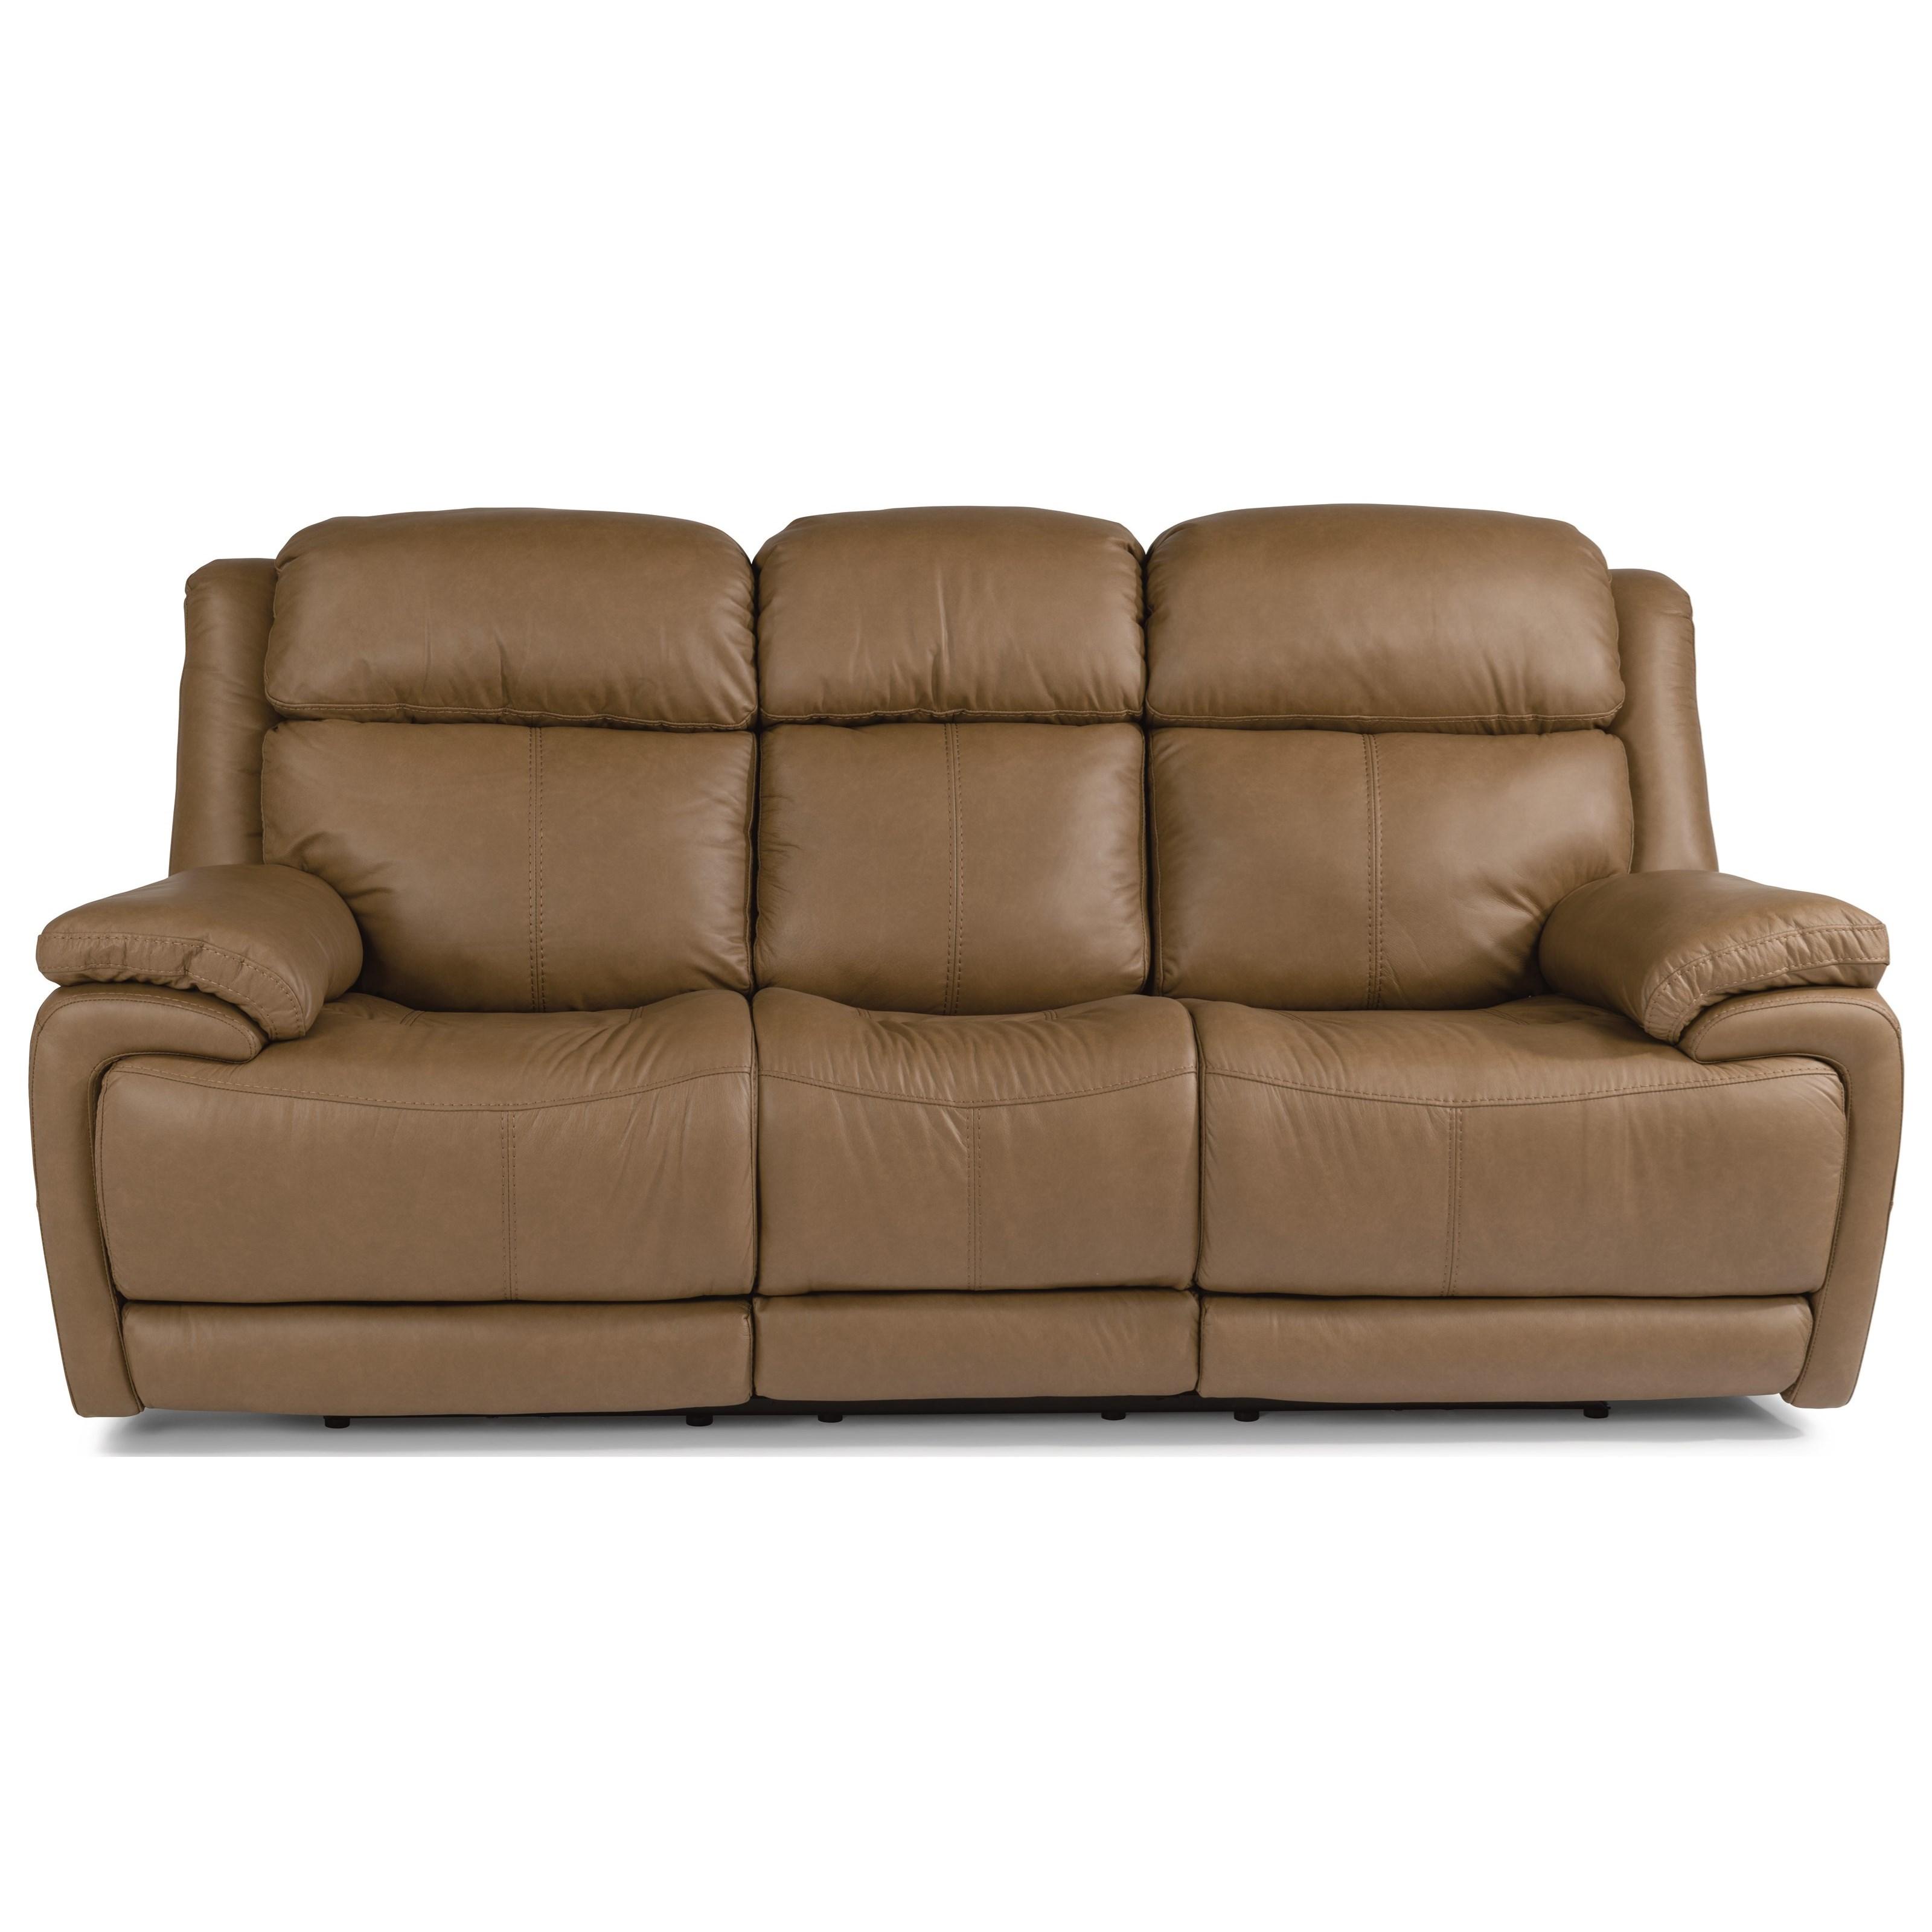 Latitudes - Elijah Power Reclining Sofa With Power Headrest by Flexsteel at Walker's Furniture